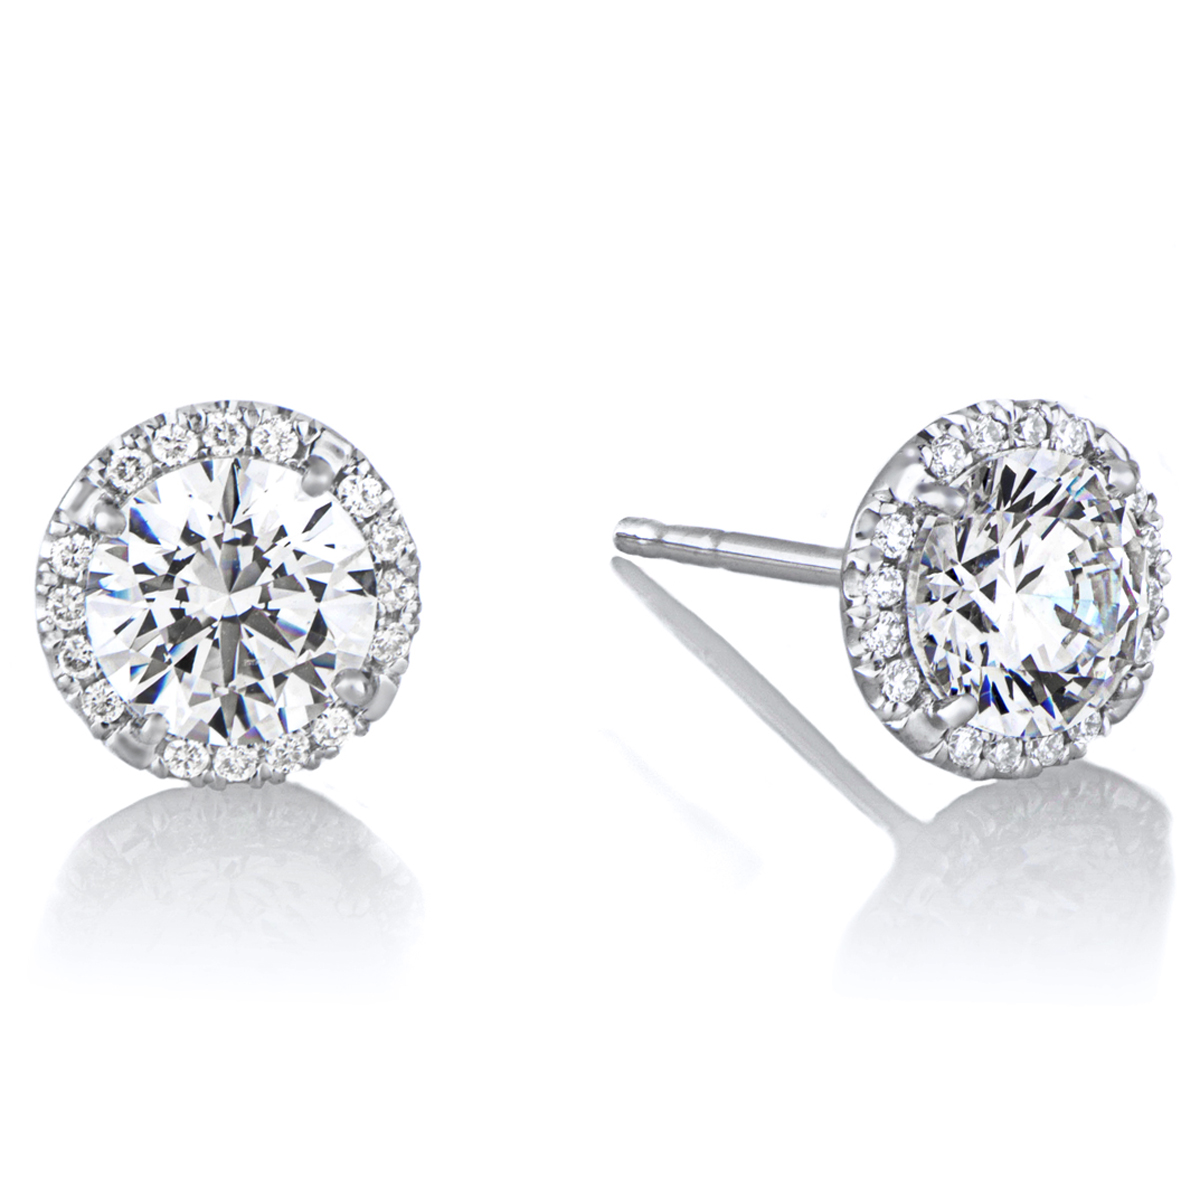 April Birthstone Stud Earrings  List Price: $135    Our Price $108